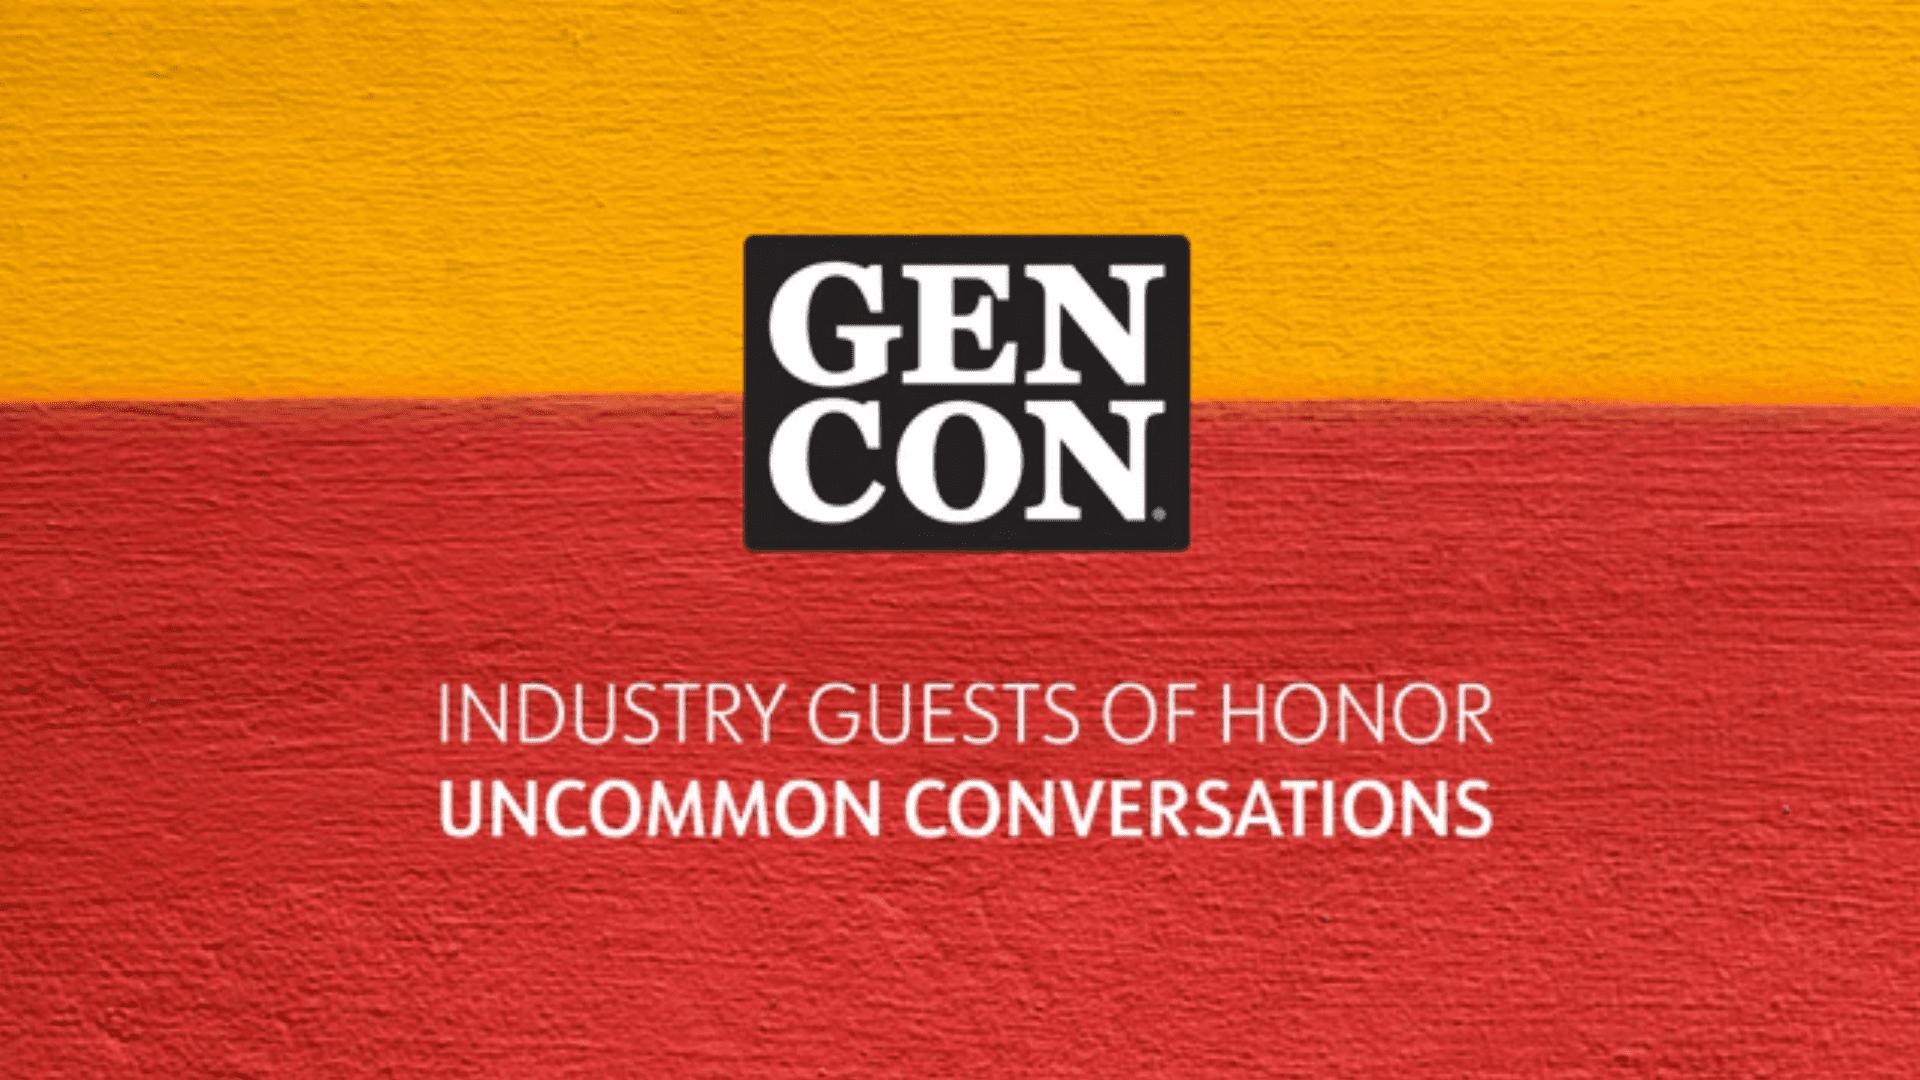 Gen Con Industry Guests of Honor